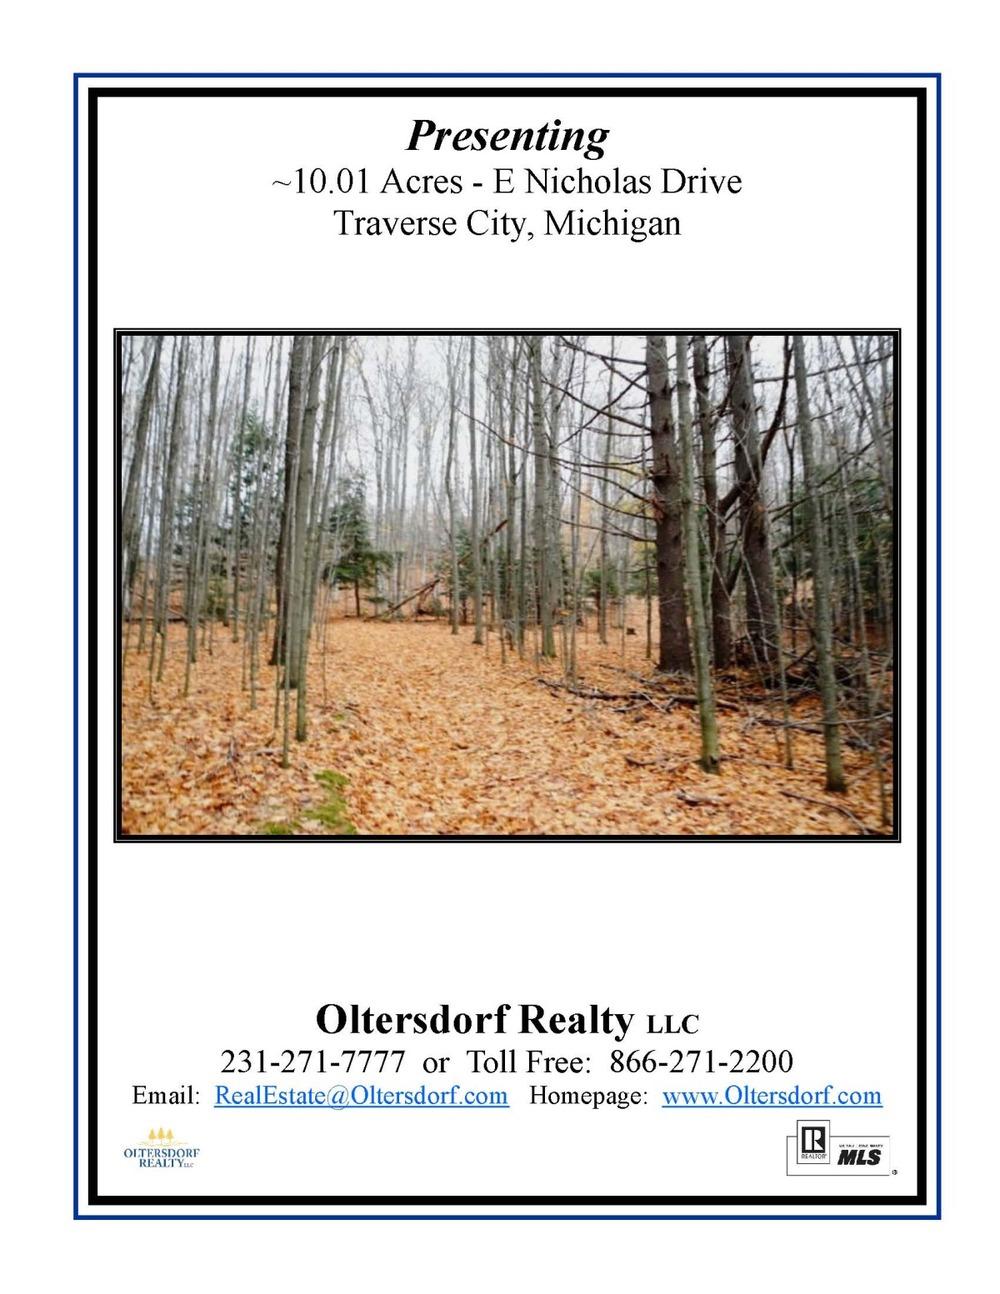 e nicholas drive, traverse city, leelanau county, acreage for sale by oltersdorf realty llc (4).jpg